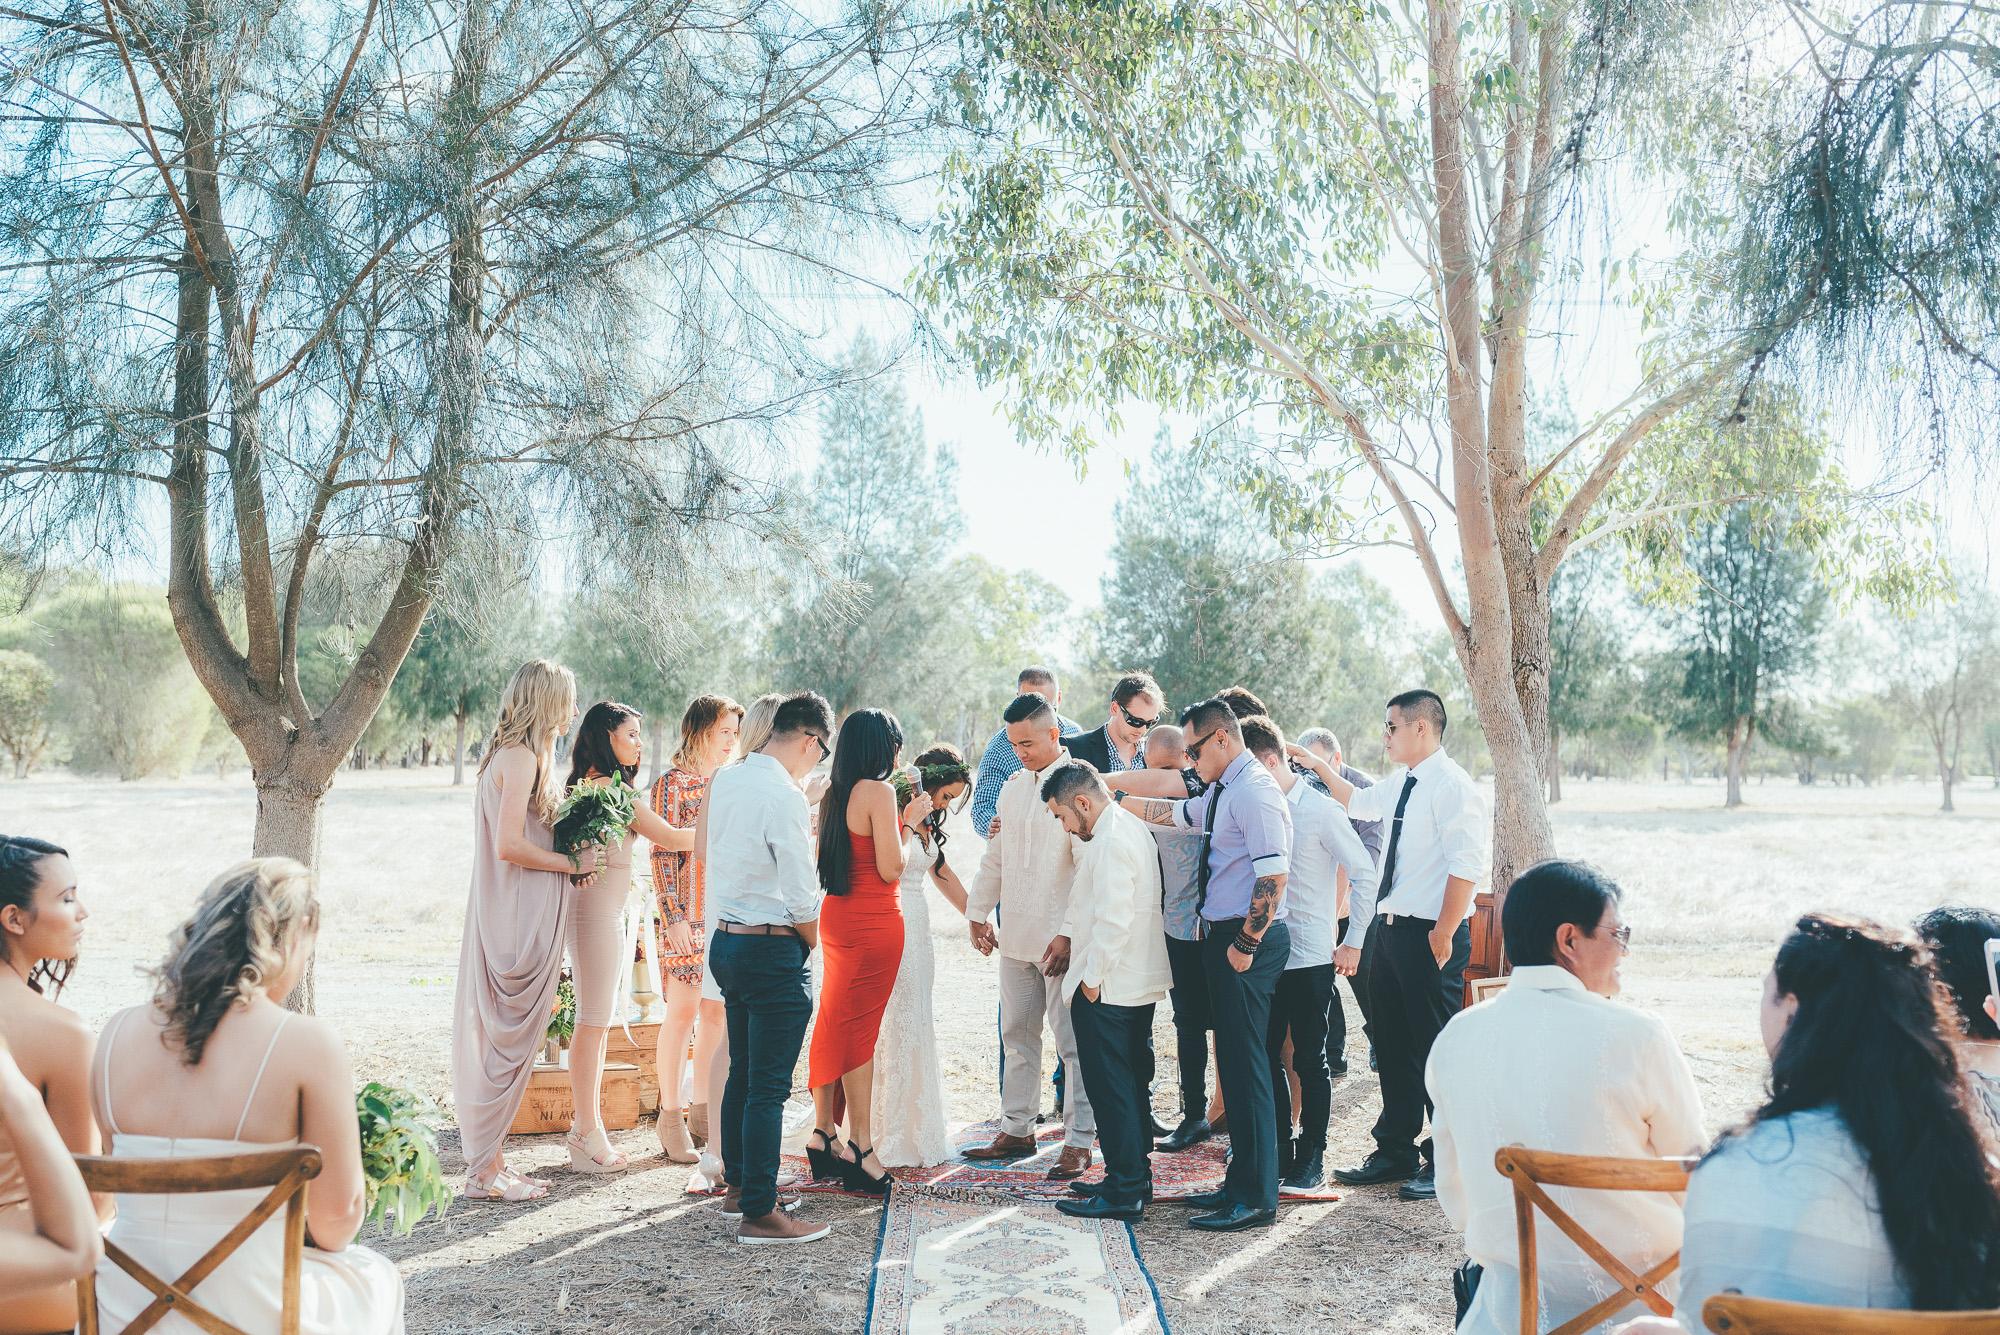 wedding-photographer-outdoor-casual-styled-los-angeles-australia-california-international-earthbound -38.jpg